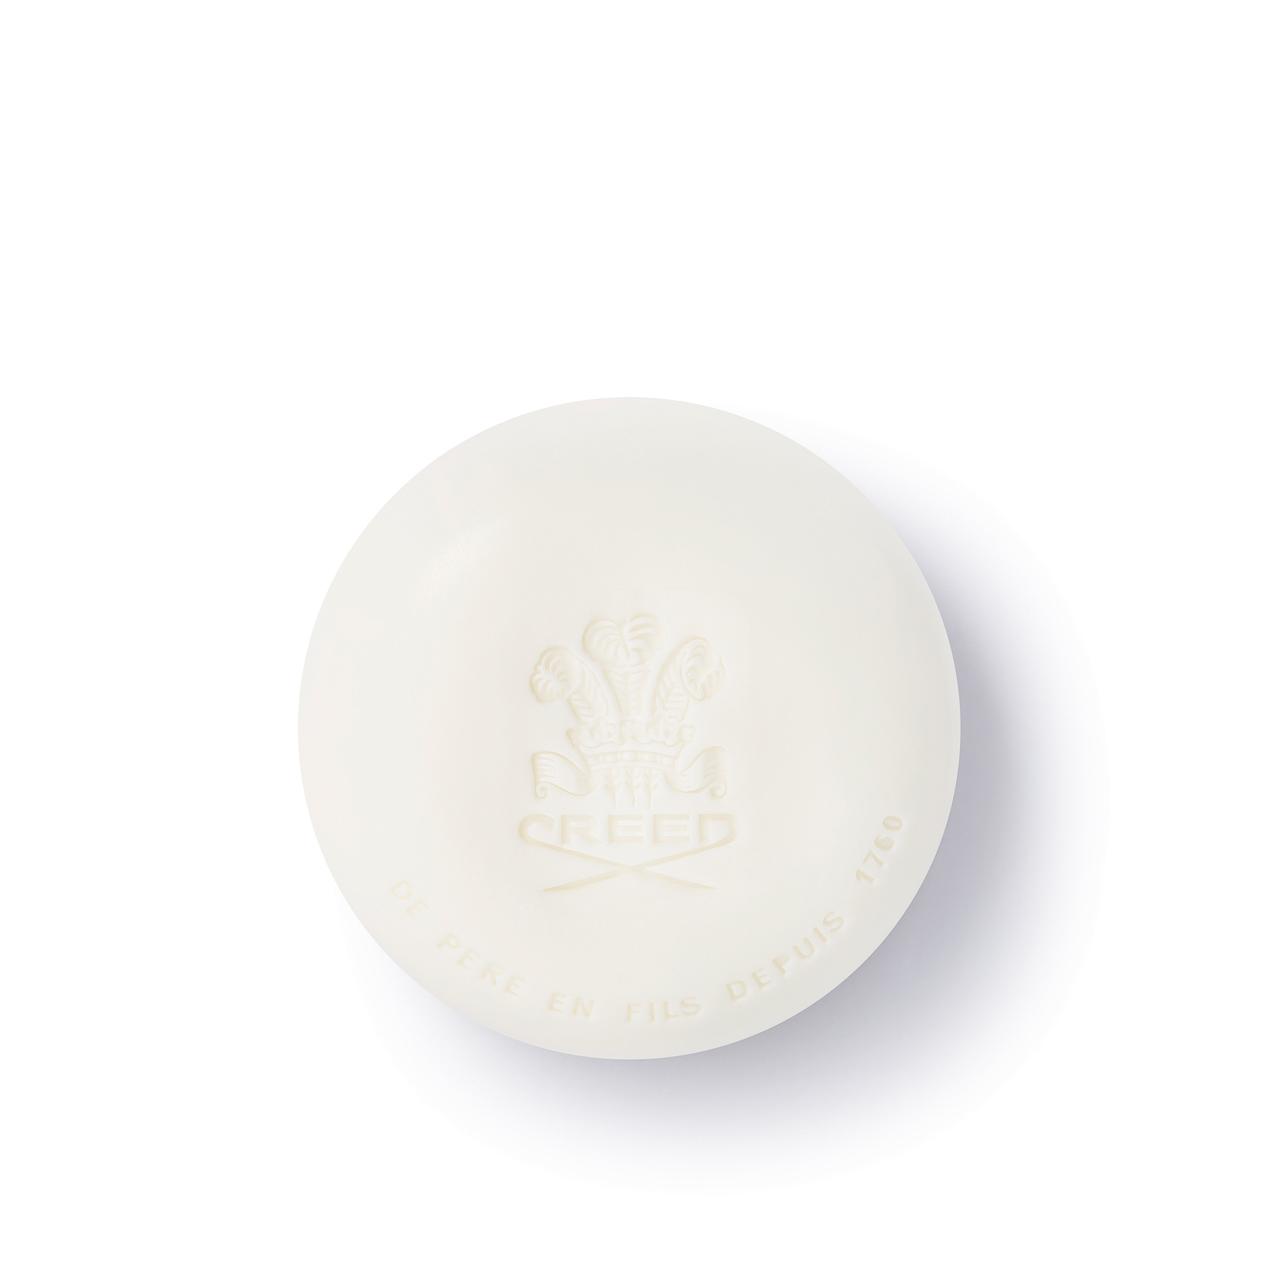 Silver Mountain Water - Bath Soap